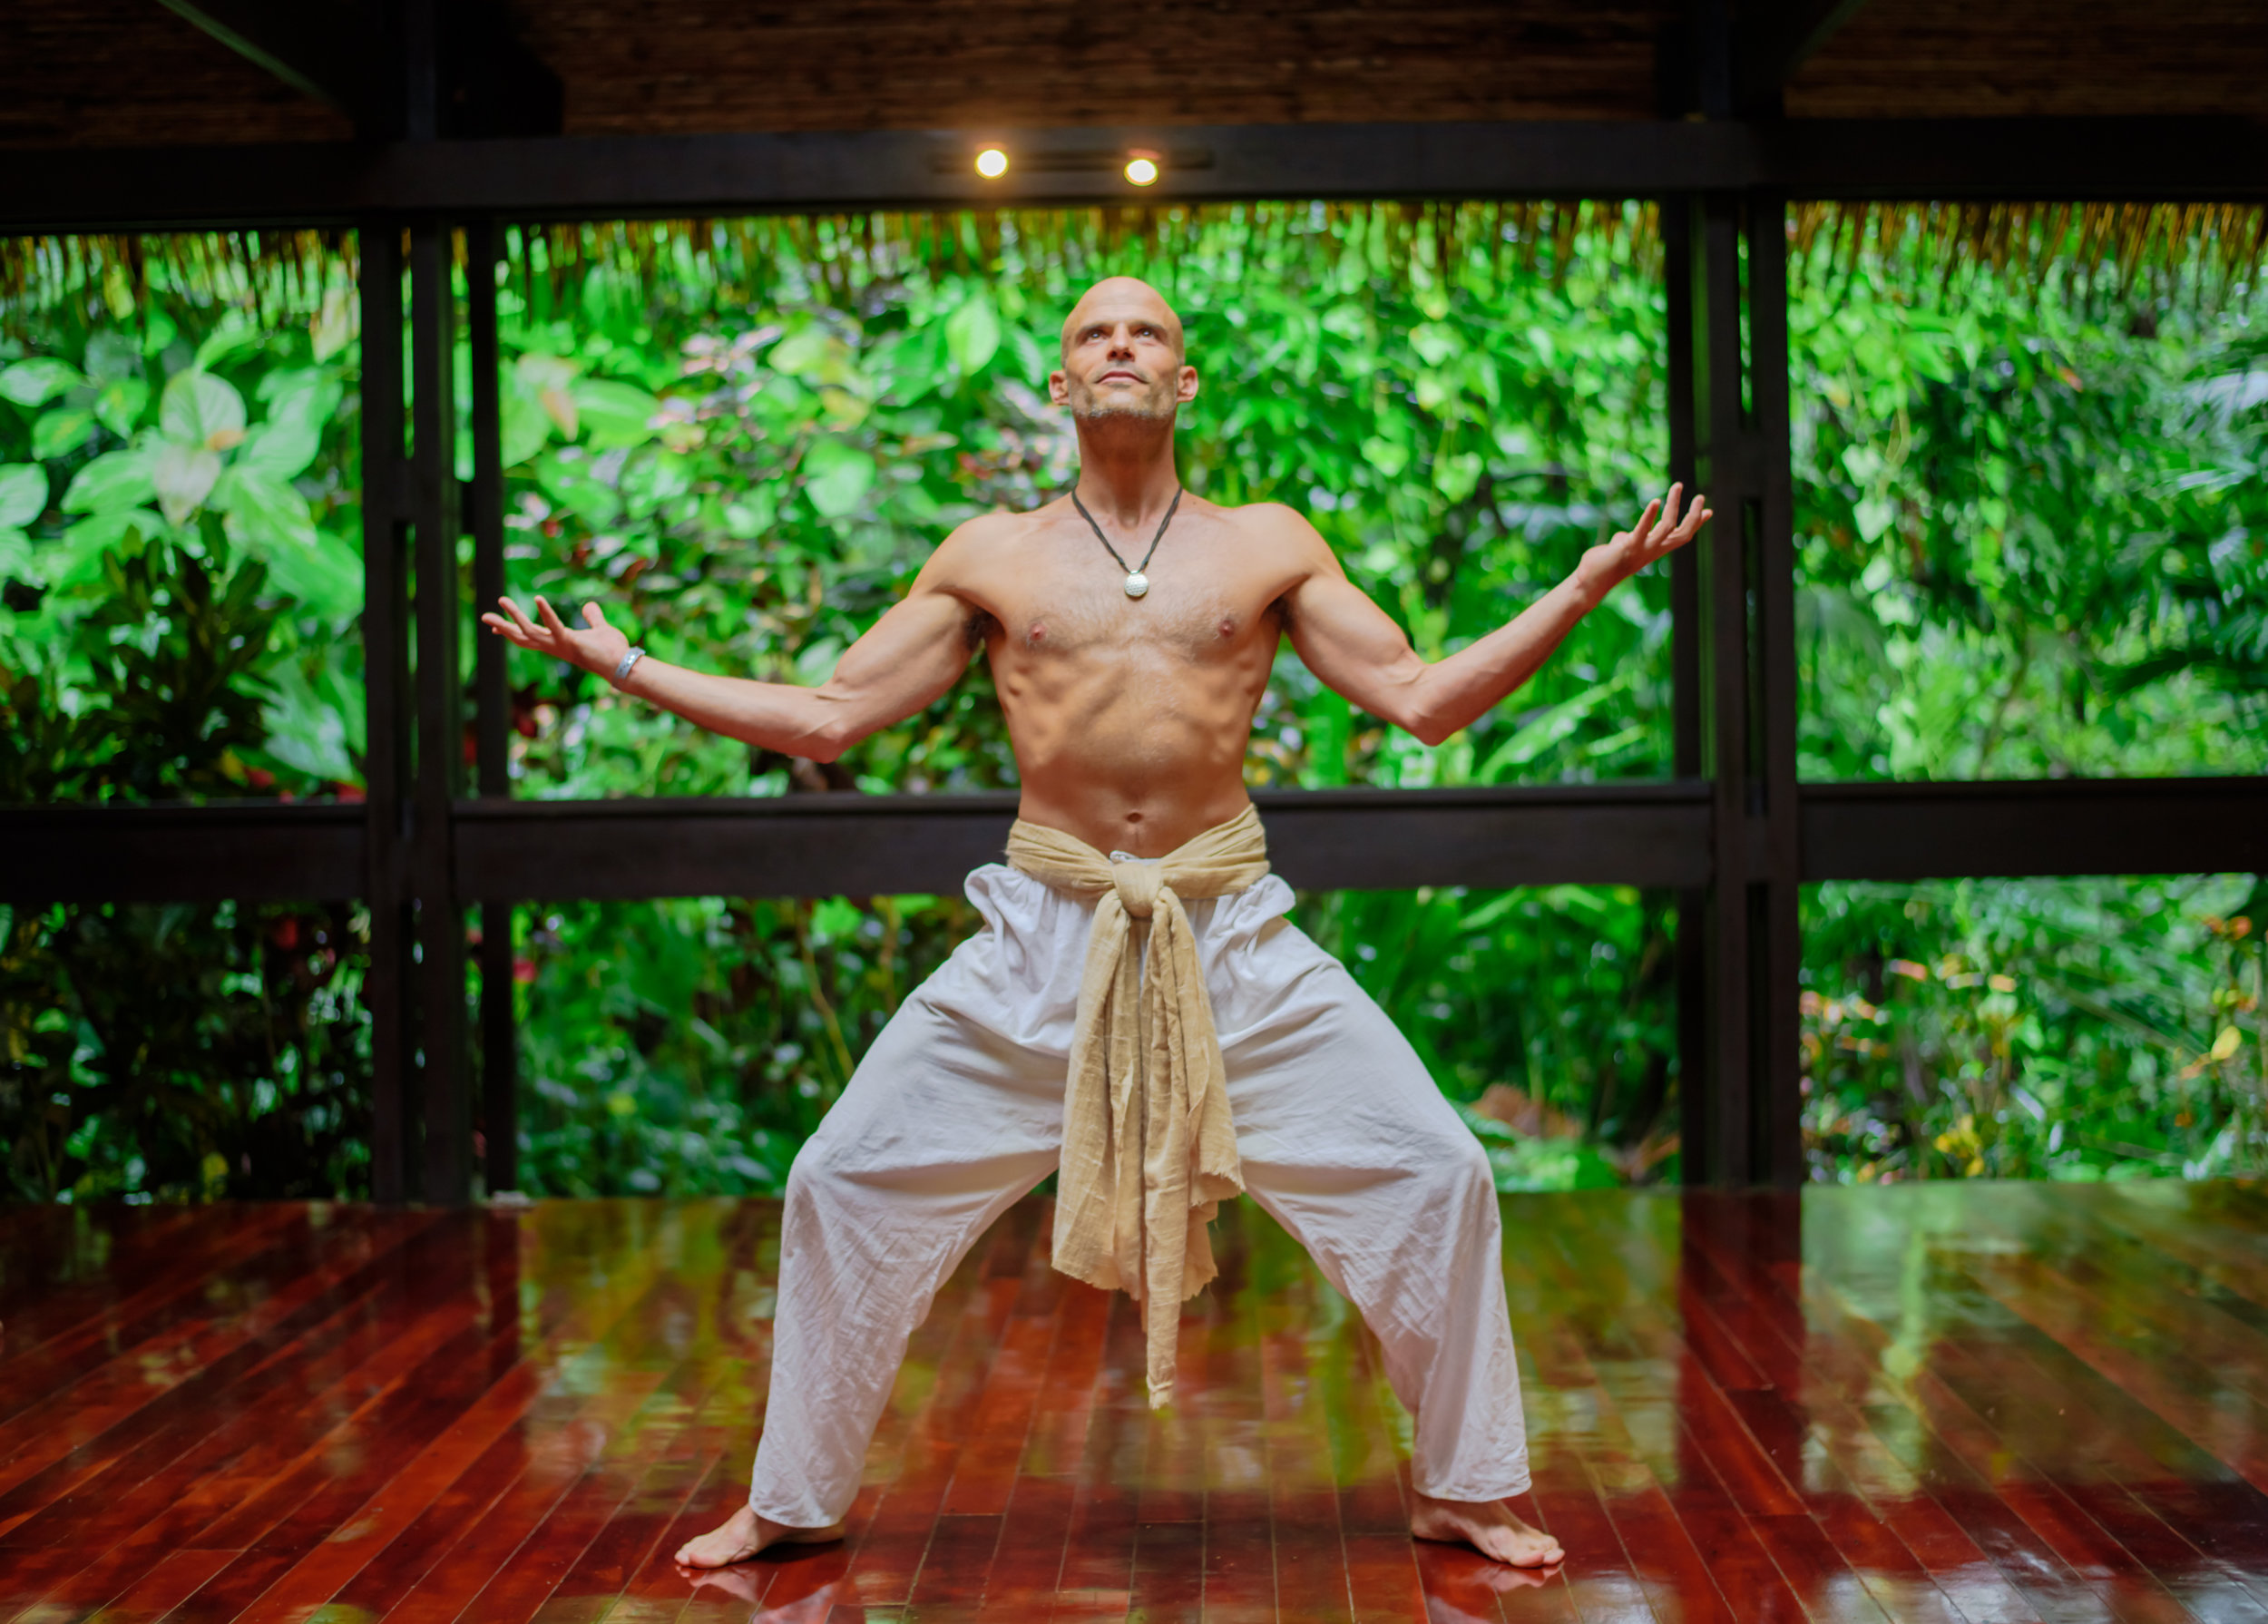 Yoga-Tabacon-Photography-CostaRica